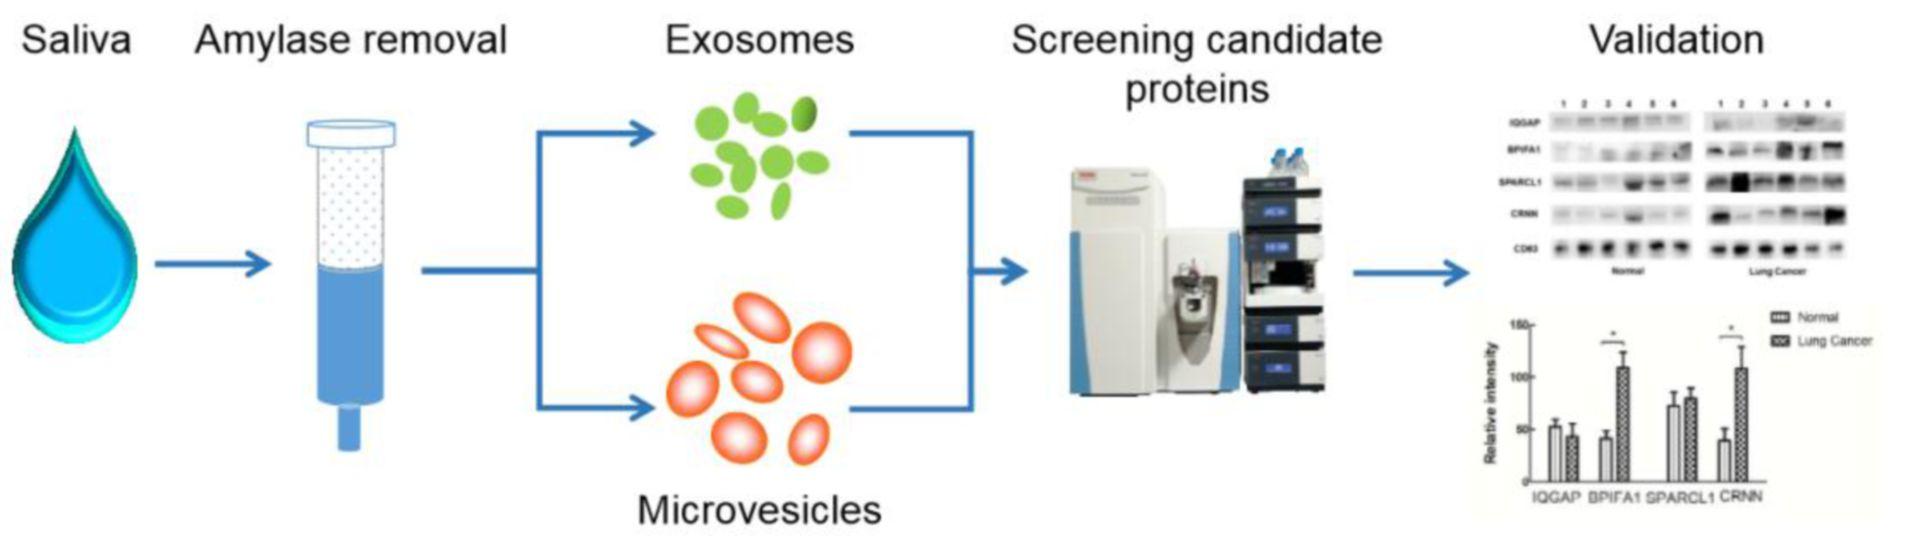 Exosome proteomics analysis